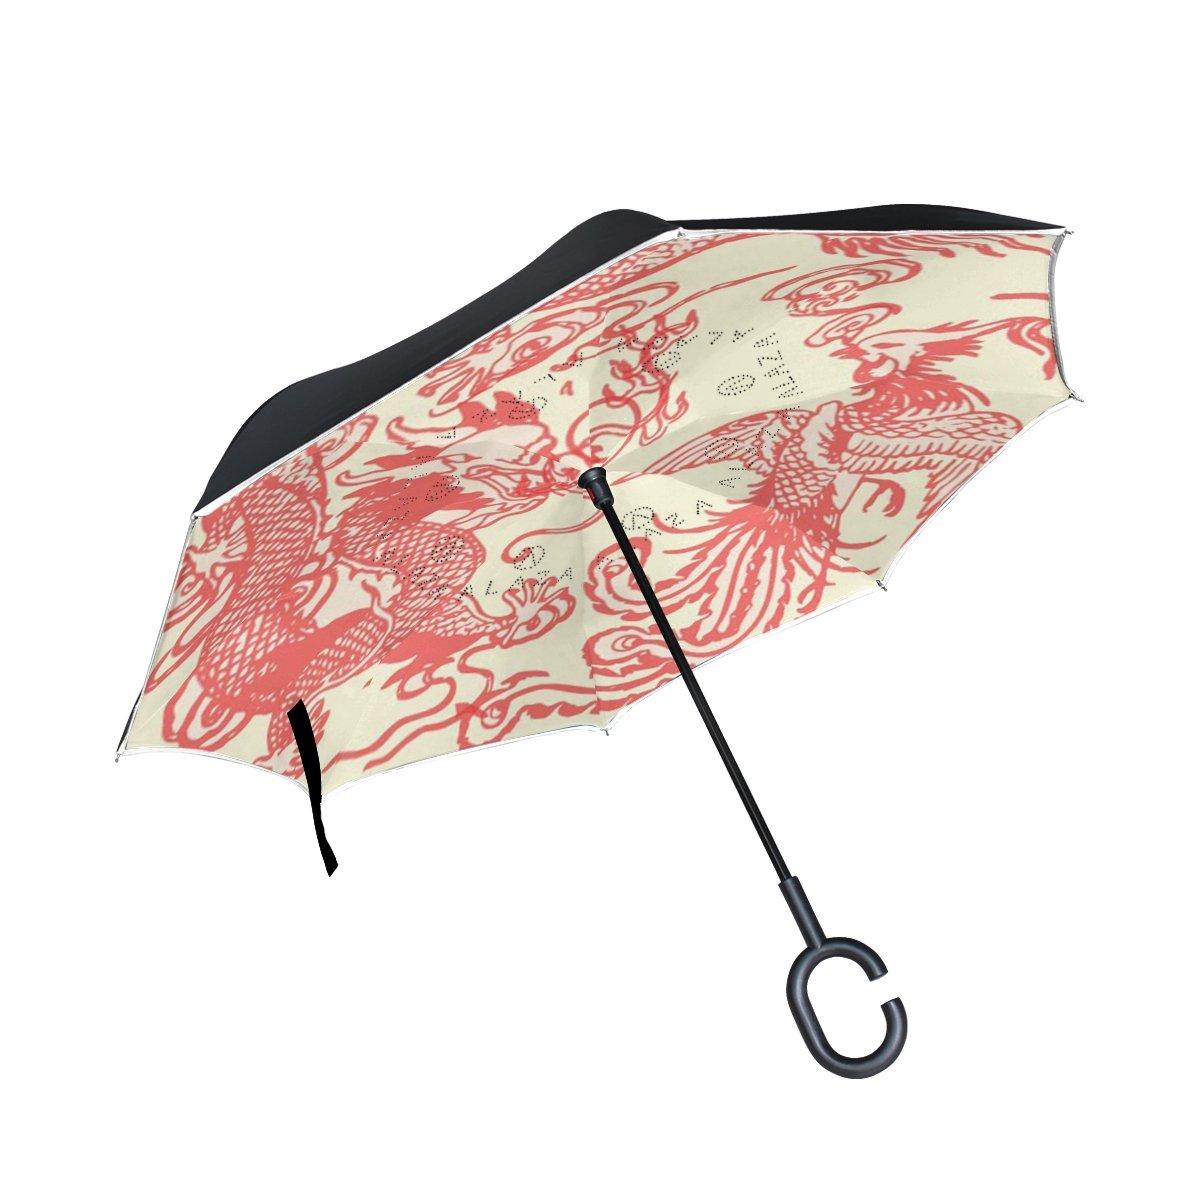 Orezi Double Layer Inverted Umbrellas逆傘車屋外の活動中に雨月ホット夏C型のハンドル、Chinoiserie Happy Dragon and Phoenix傘の女性   B07B2TXFD8